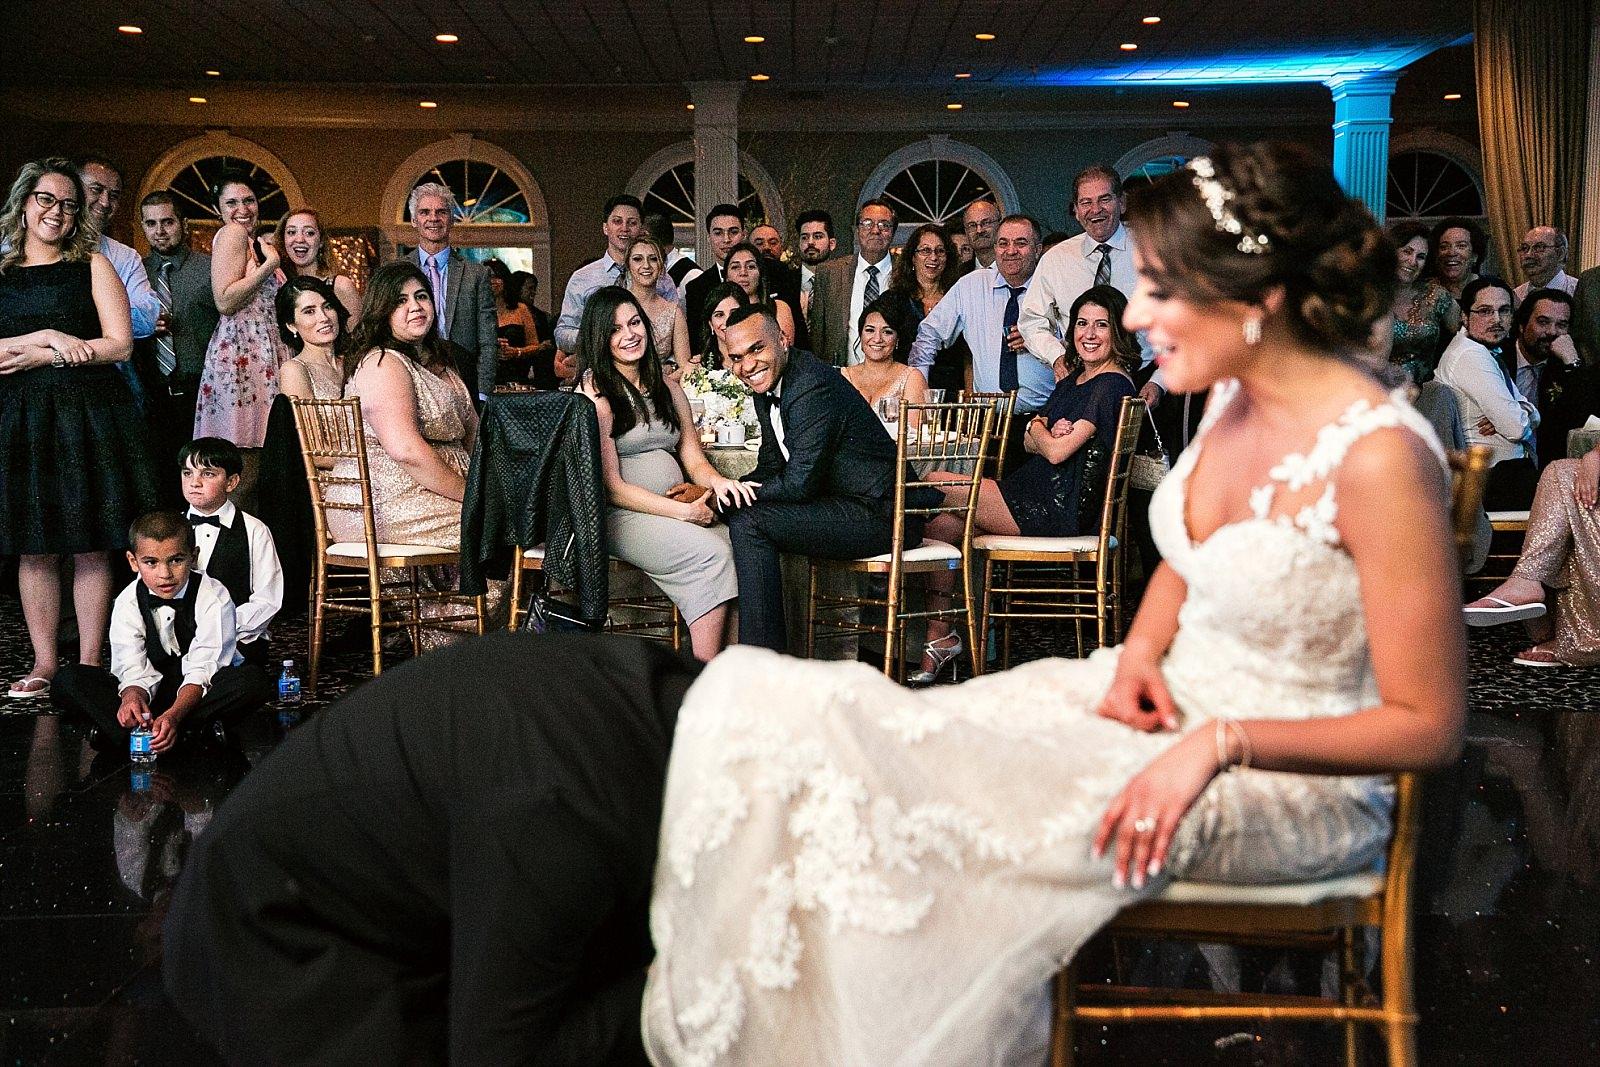 NY_Wedding_Photographer_NiPe_41.jpg